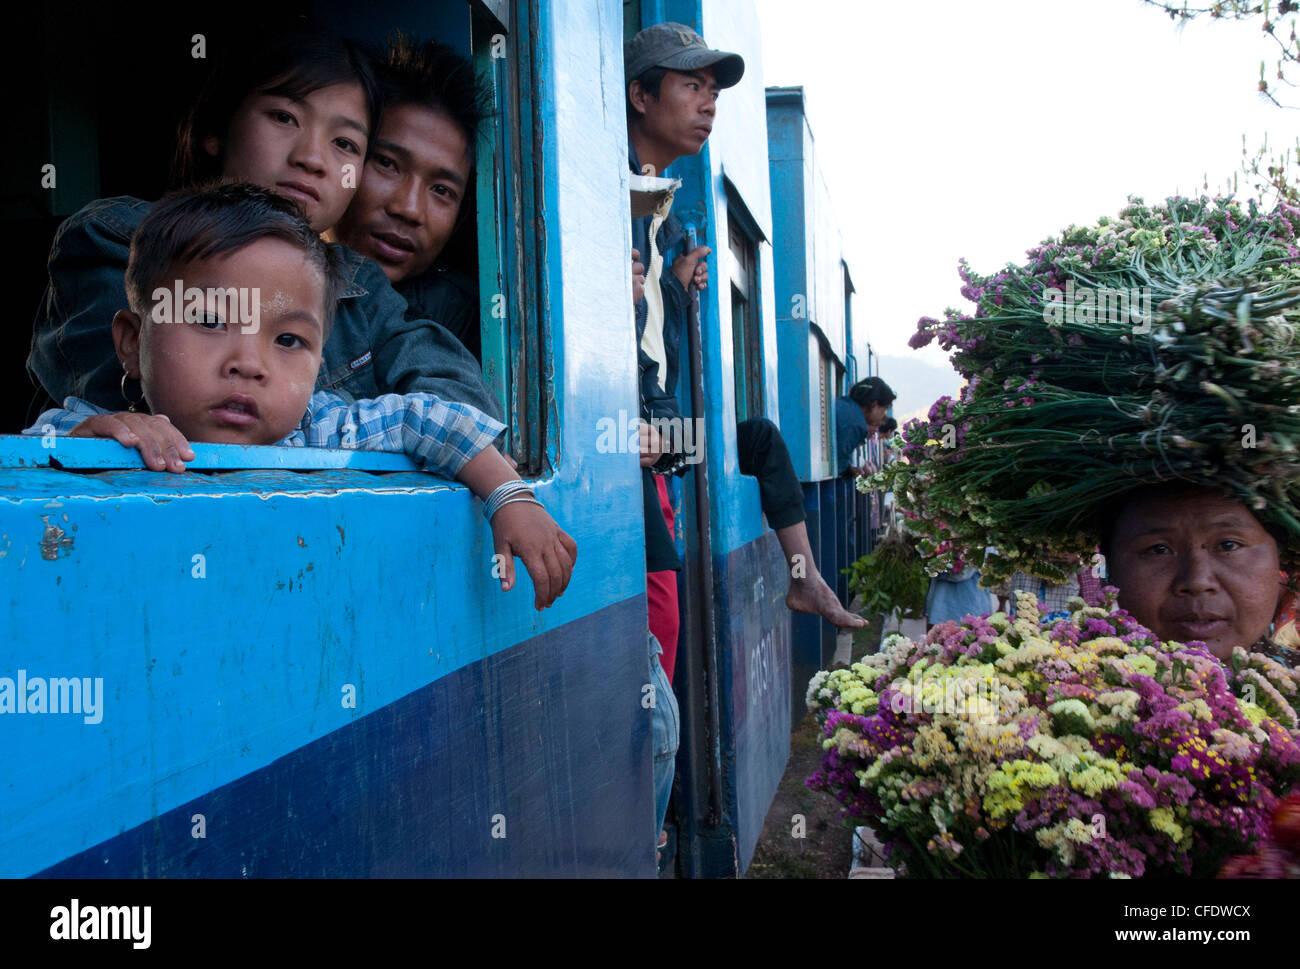 Vendors and passengers at Mindayik train station, Thazi to Shwenyaung train line, Myanmar, Asia - Stock Image